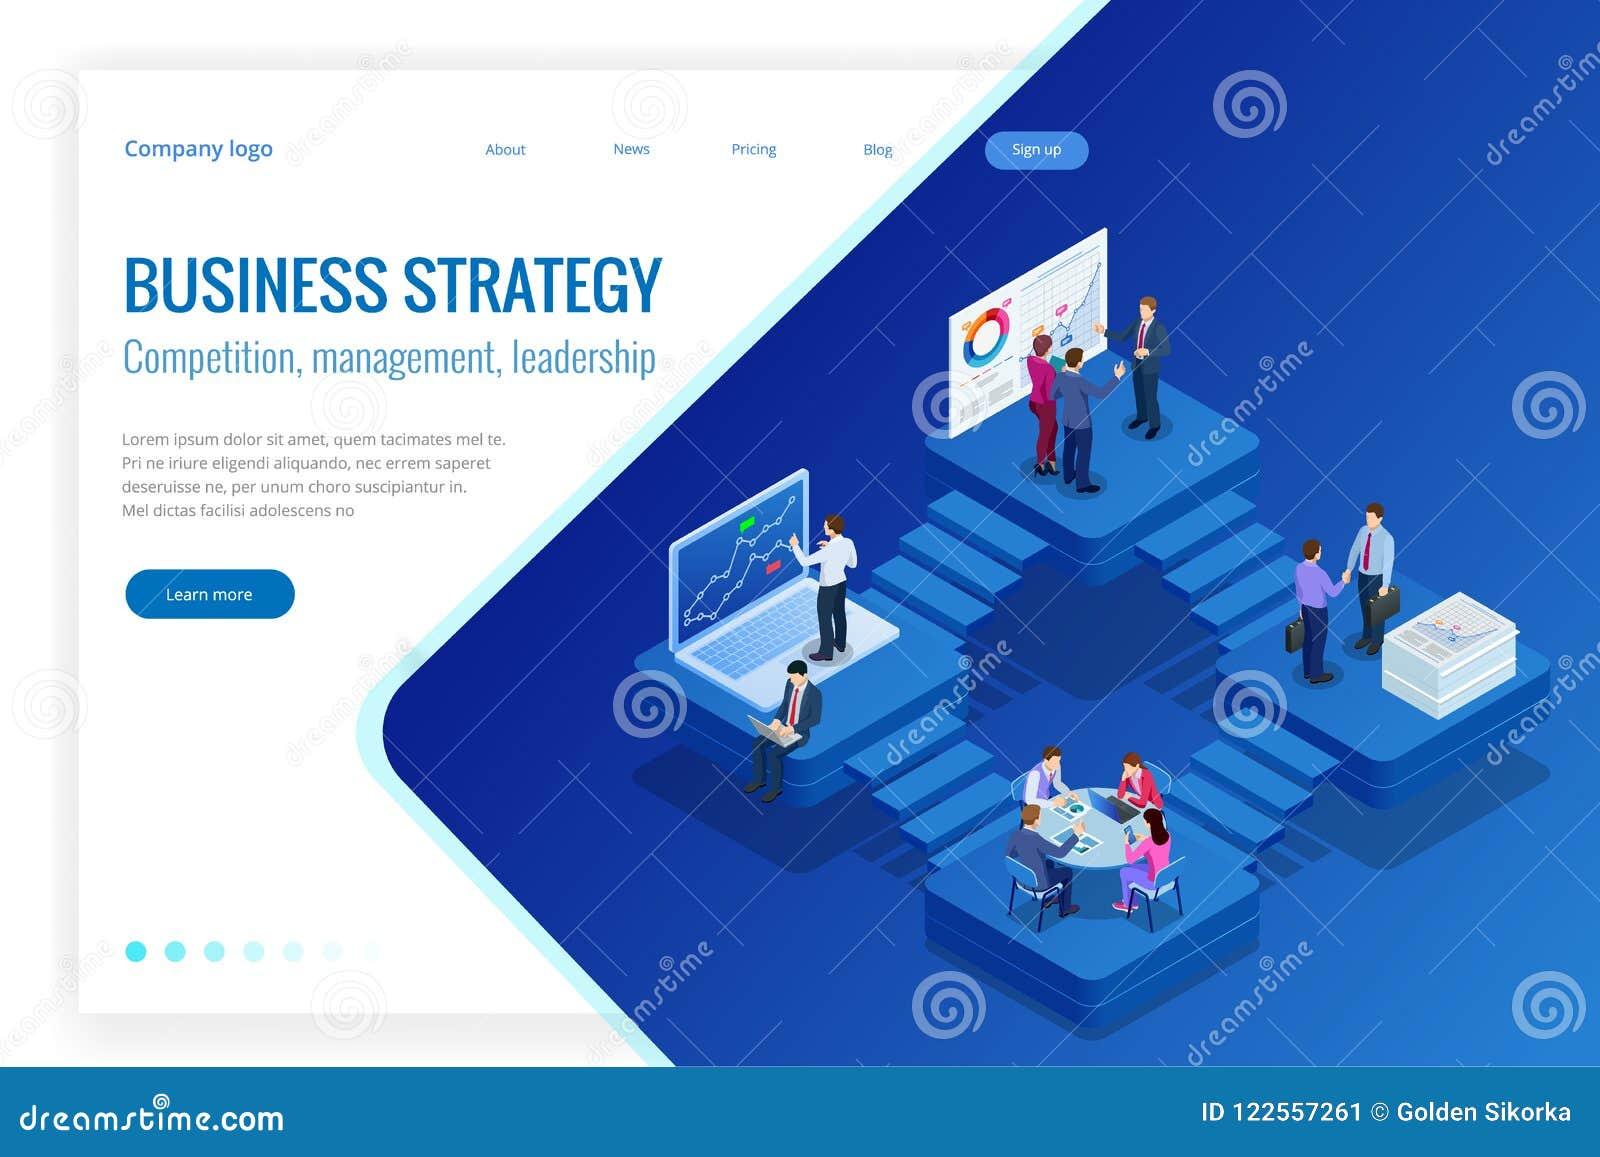 Isometric στοιχεία και επένδυση ανάλυσης Διαχείριση του προγράμματος, επιχειρησιακή επικοινωνία, ροή της δουλειάς και διαβούλευση